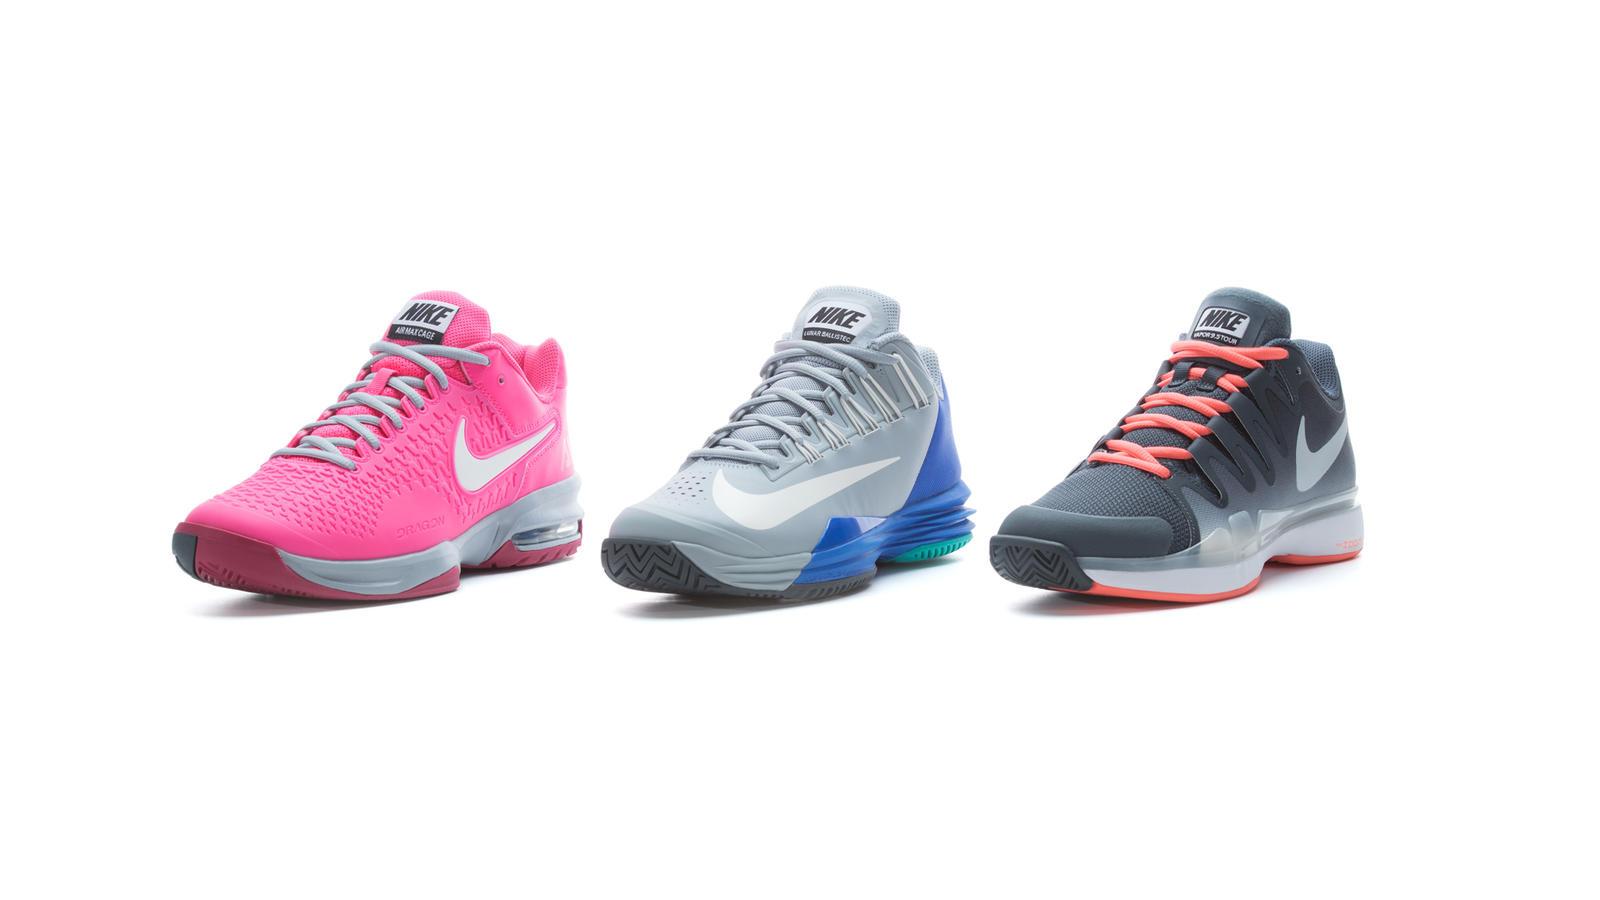 Nike Tennis Women's Footwear - New York 2014